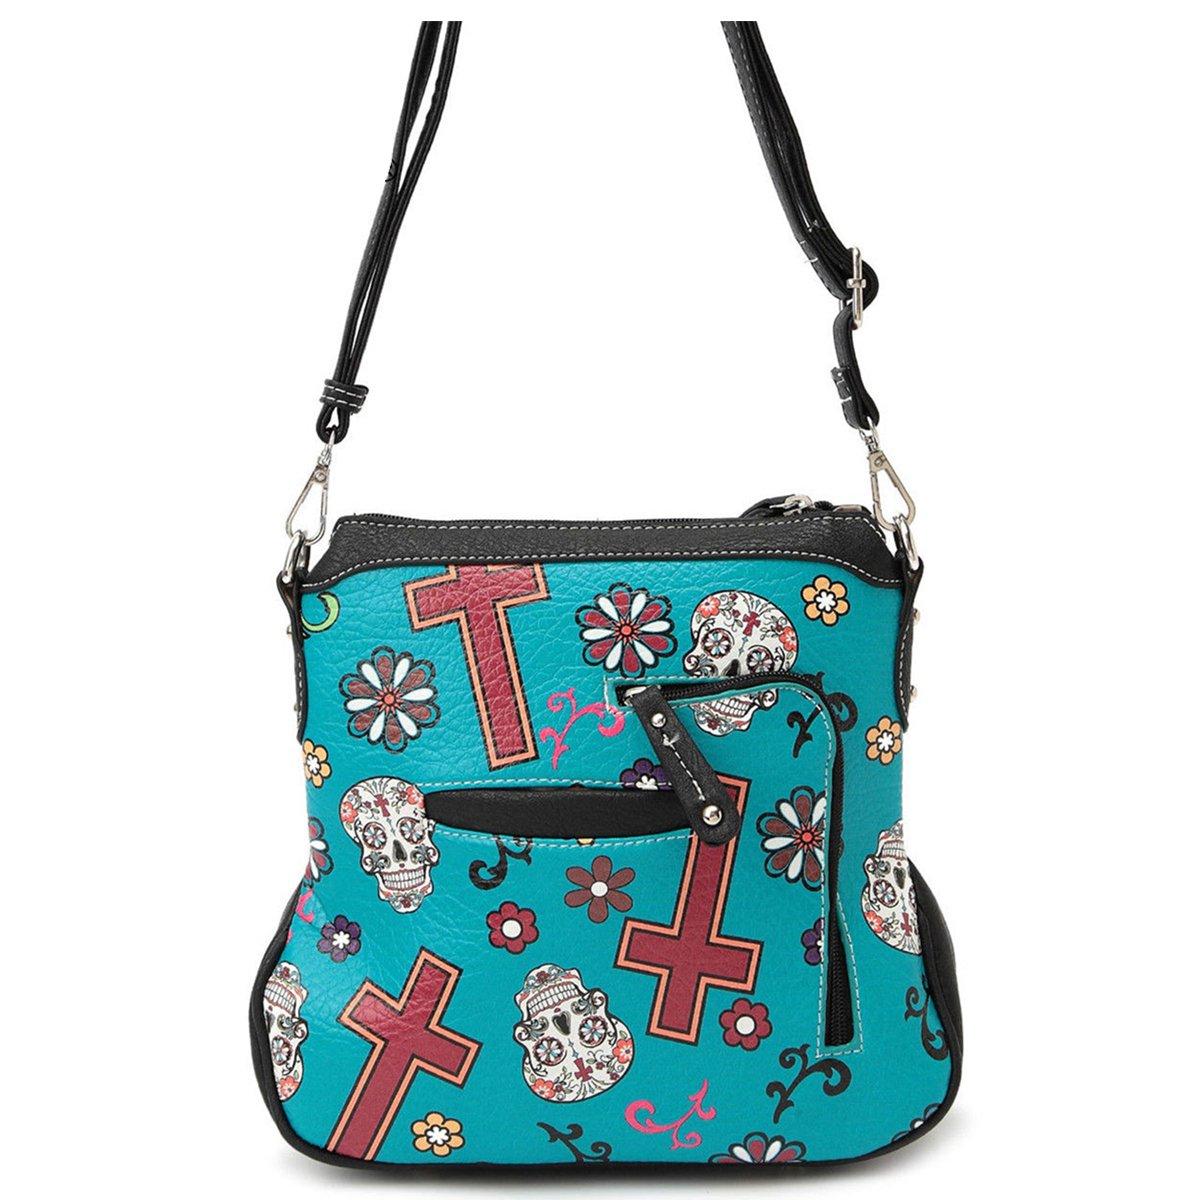 Western Sugar Skull Mini Handbag Girl Crossbody Purse Fashion Single Shoulder Bag Phone Purses (Turquoise) by WESTERN ORIGIN (Image #3)